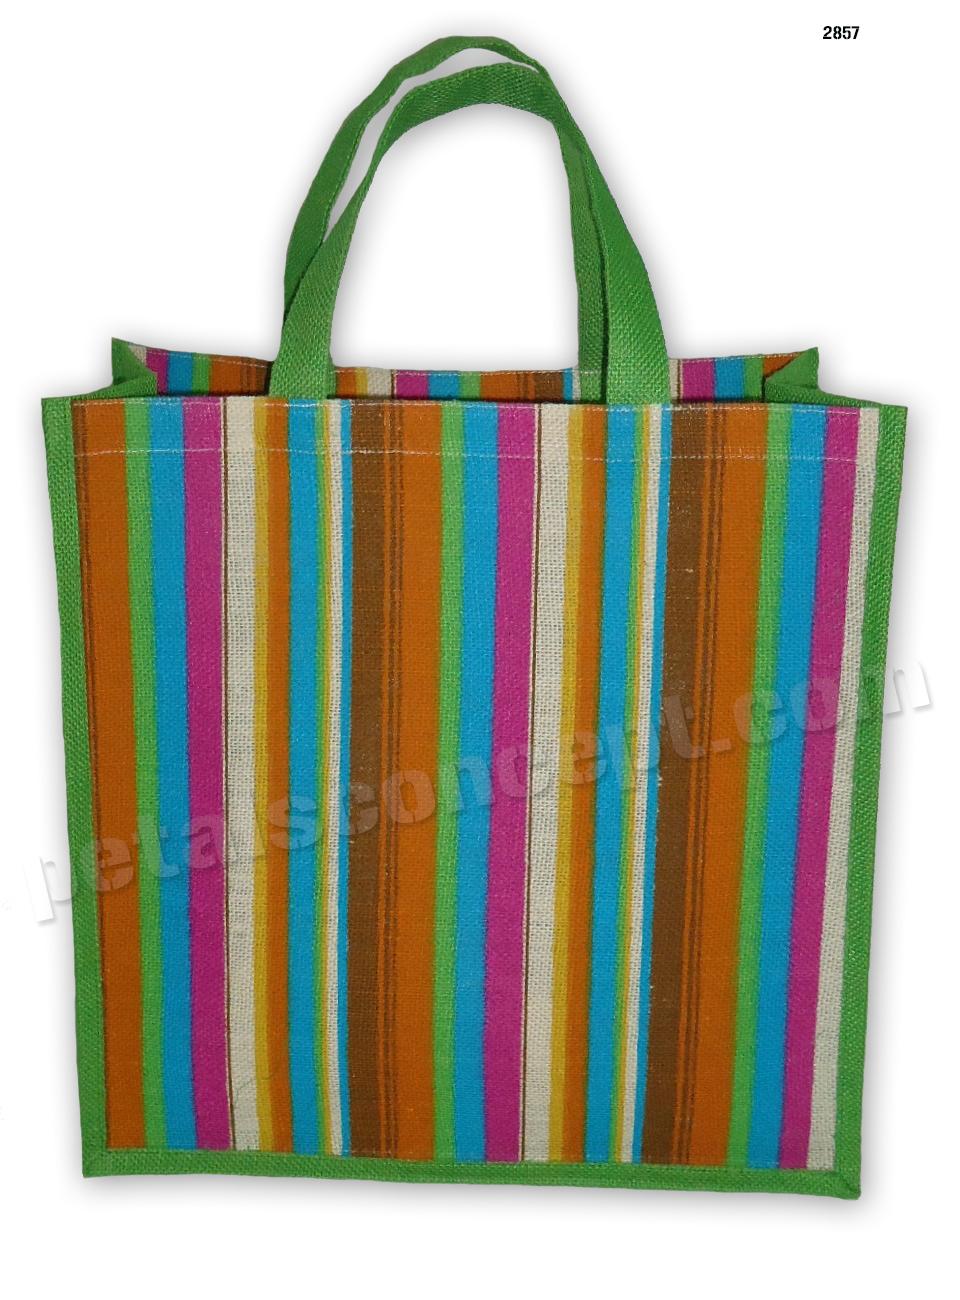 Self Handle Multicolor Stripe Print Dyed Color PP Laminated Jute bag